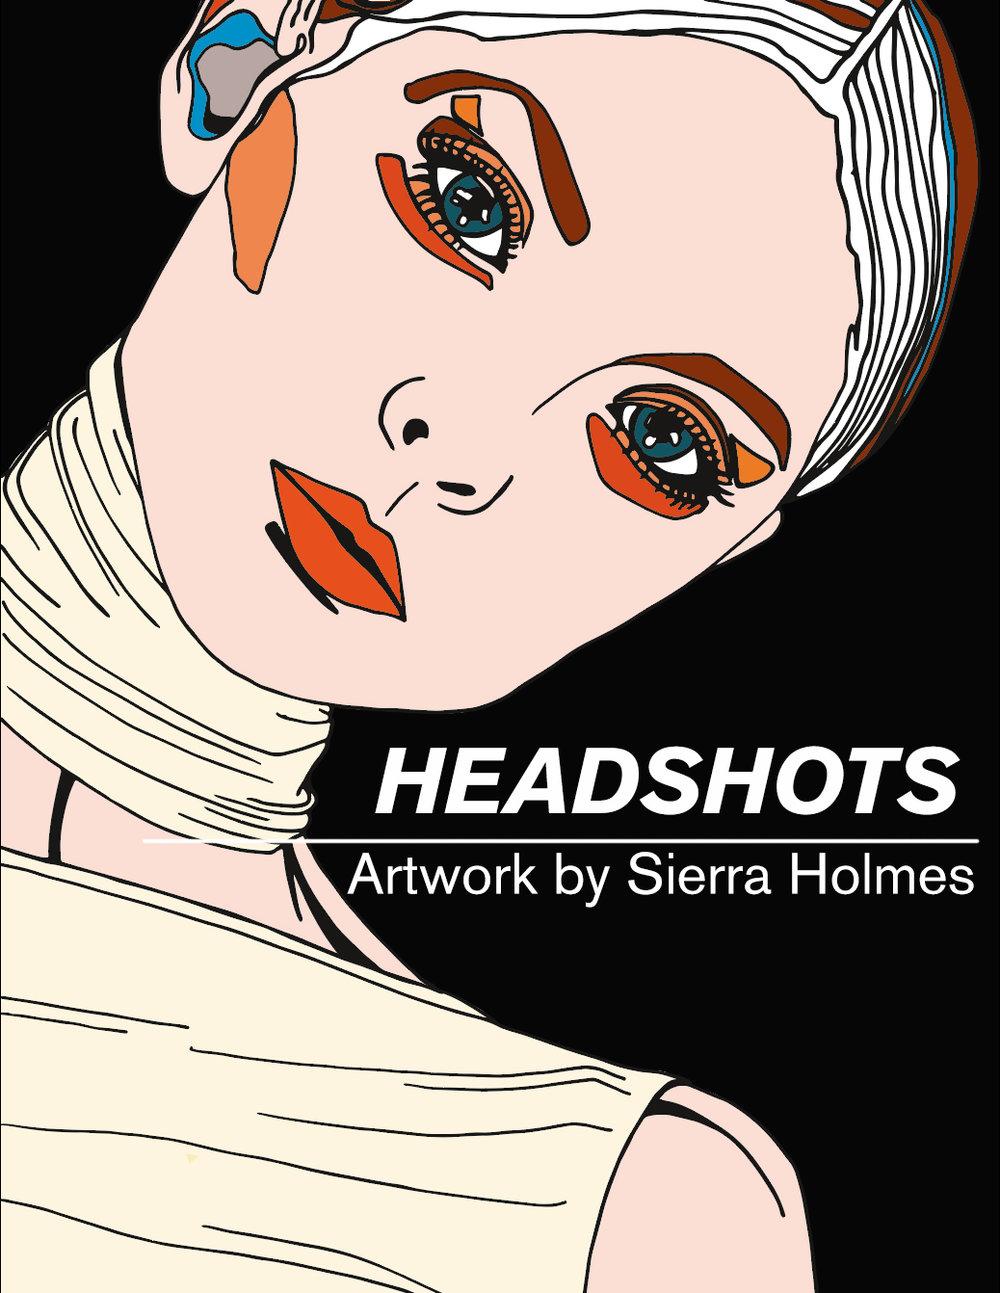 headshots-sierra-holmes